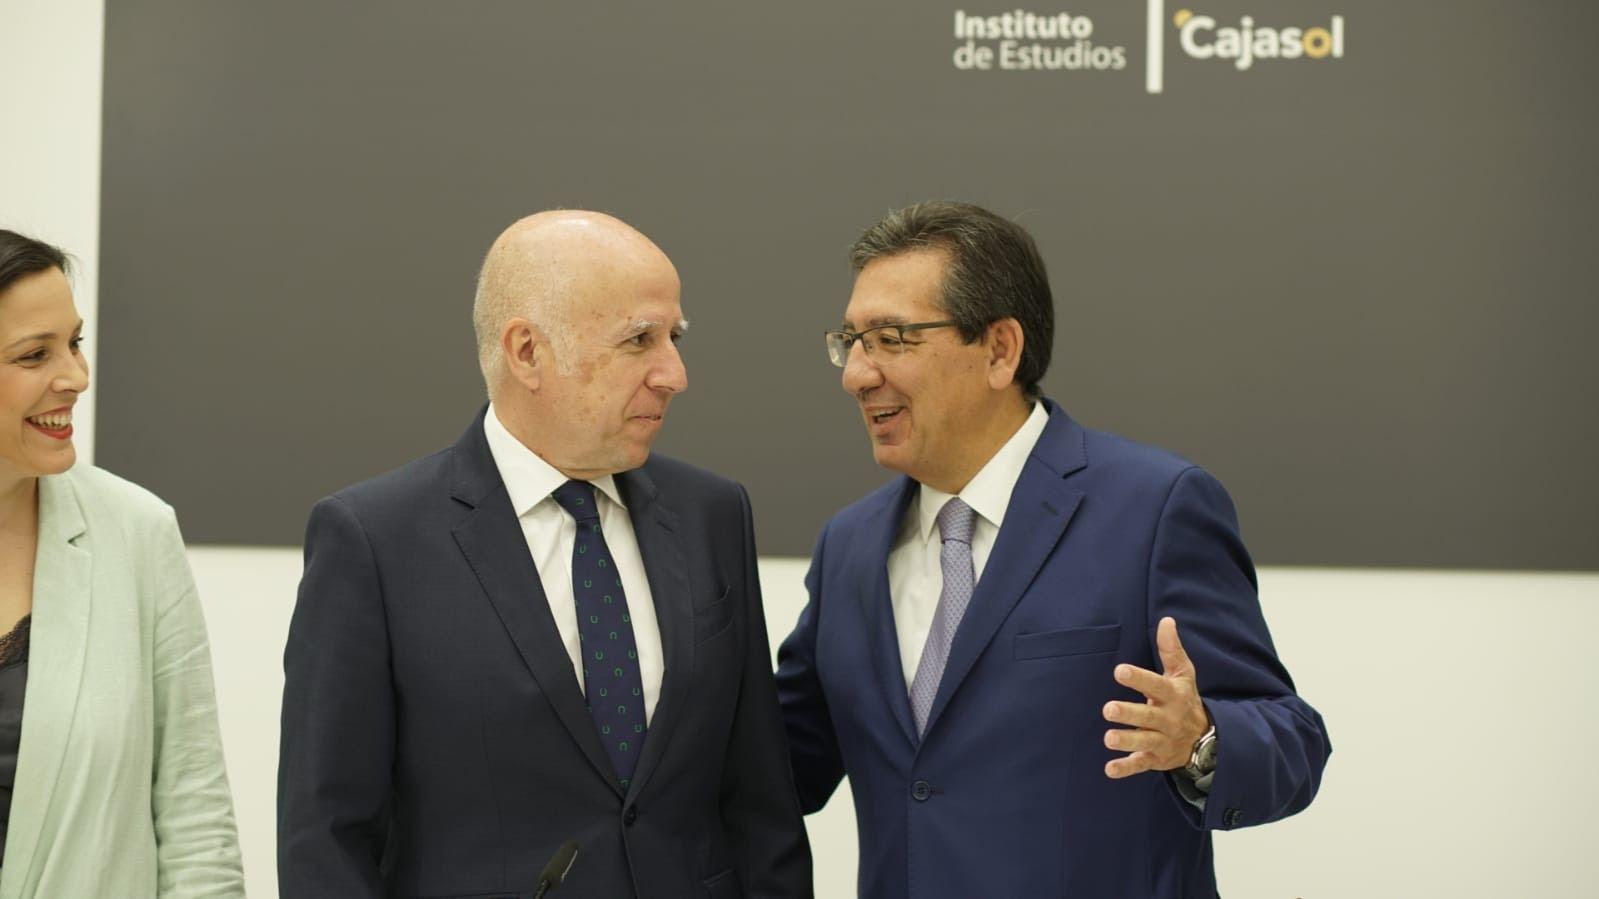 Antonio Pulido e Hilario Albarracin de KPMG